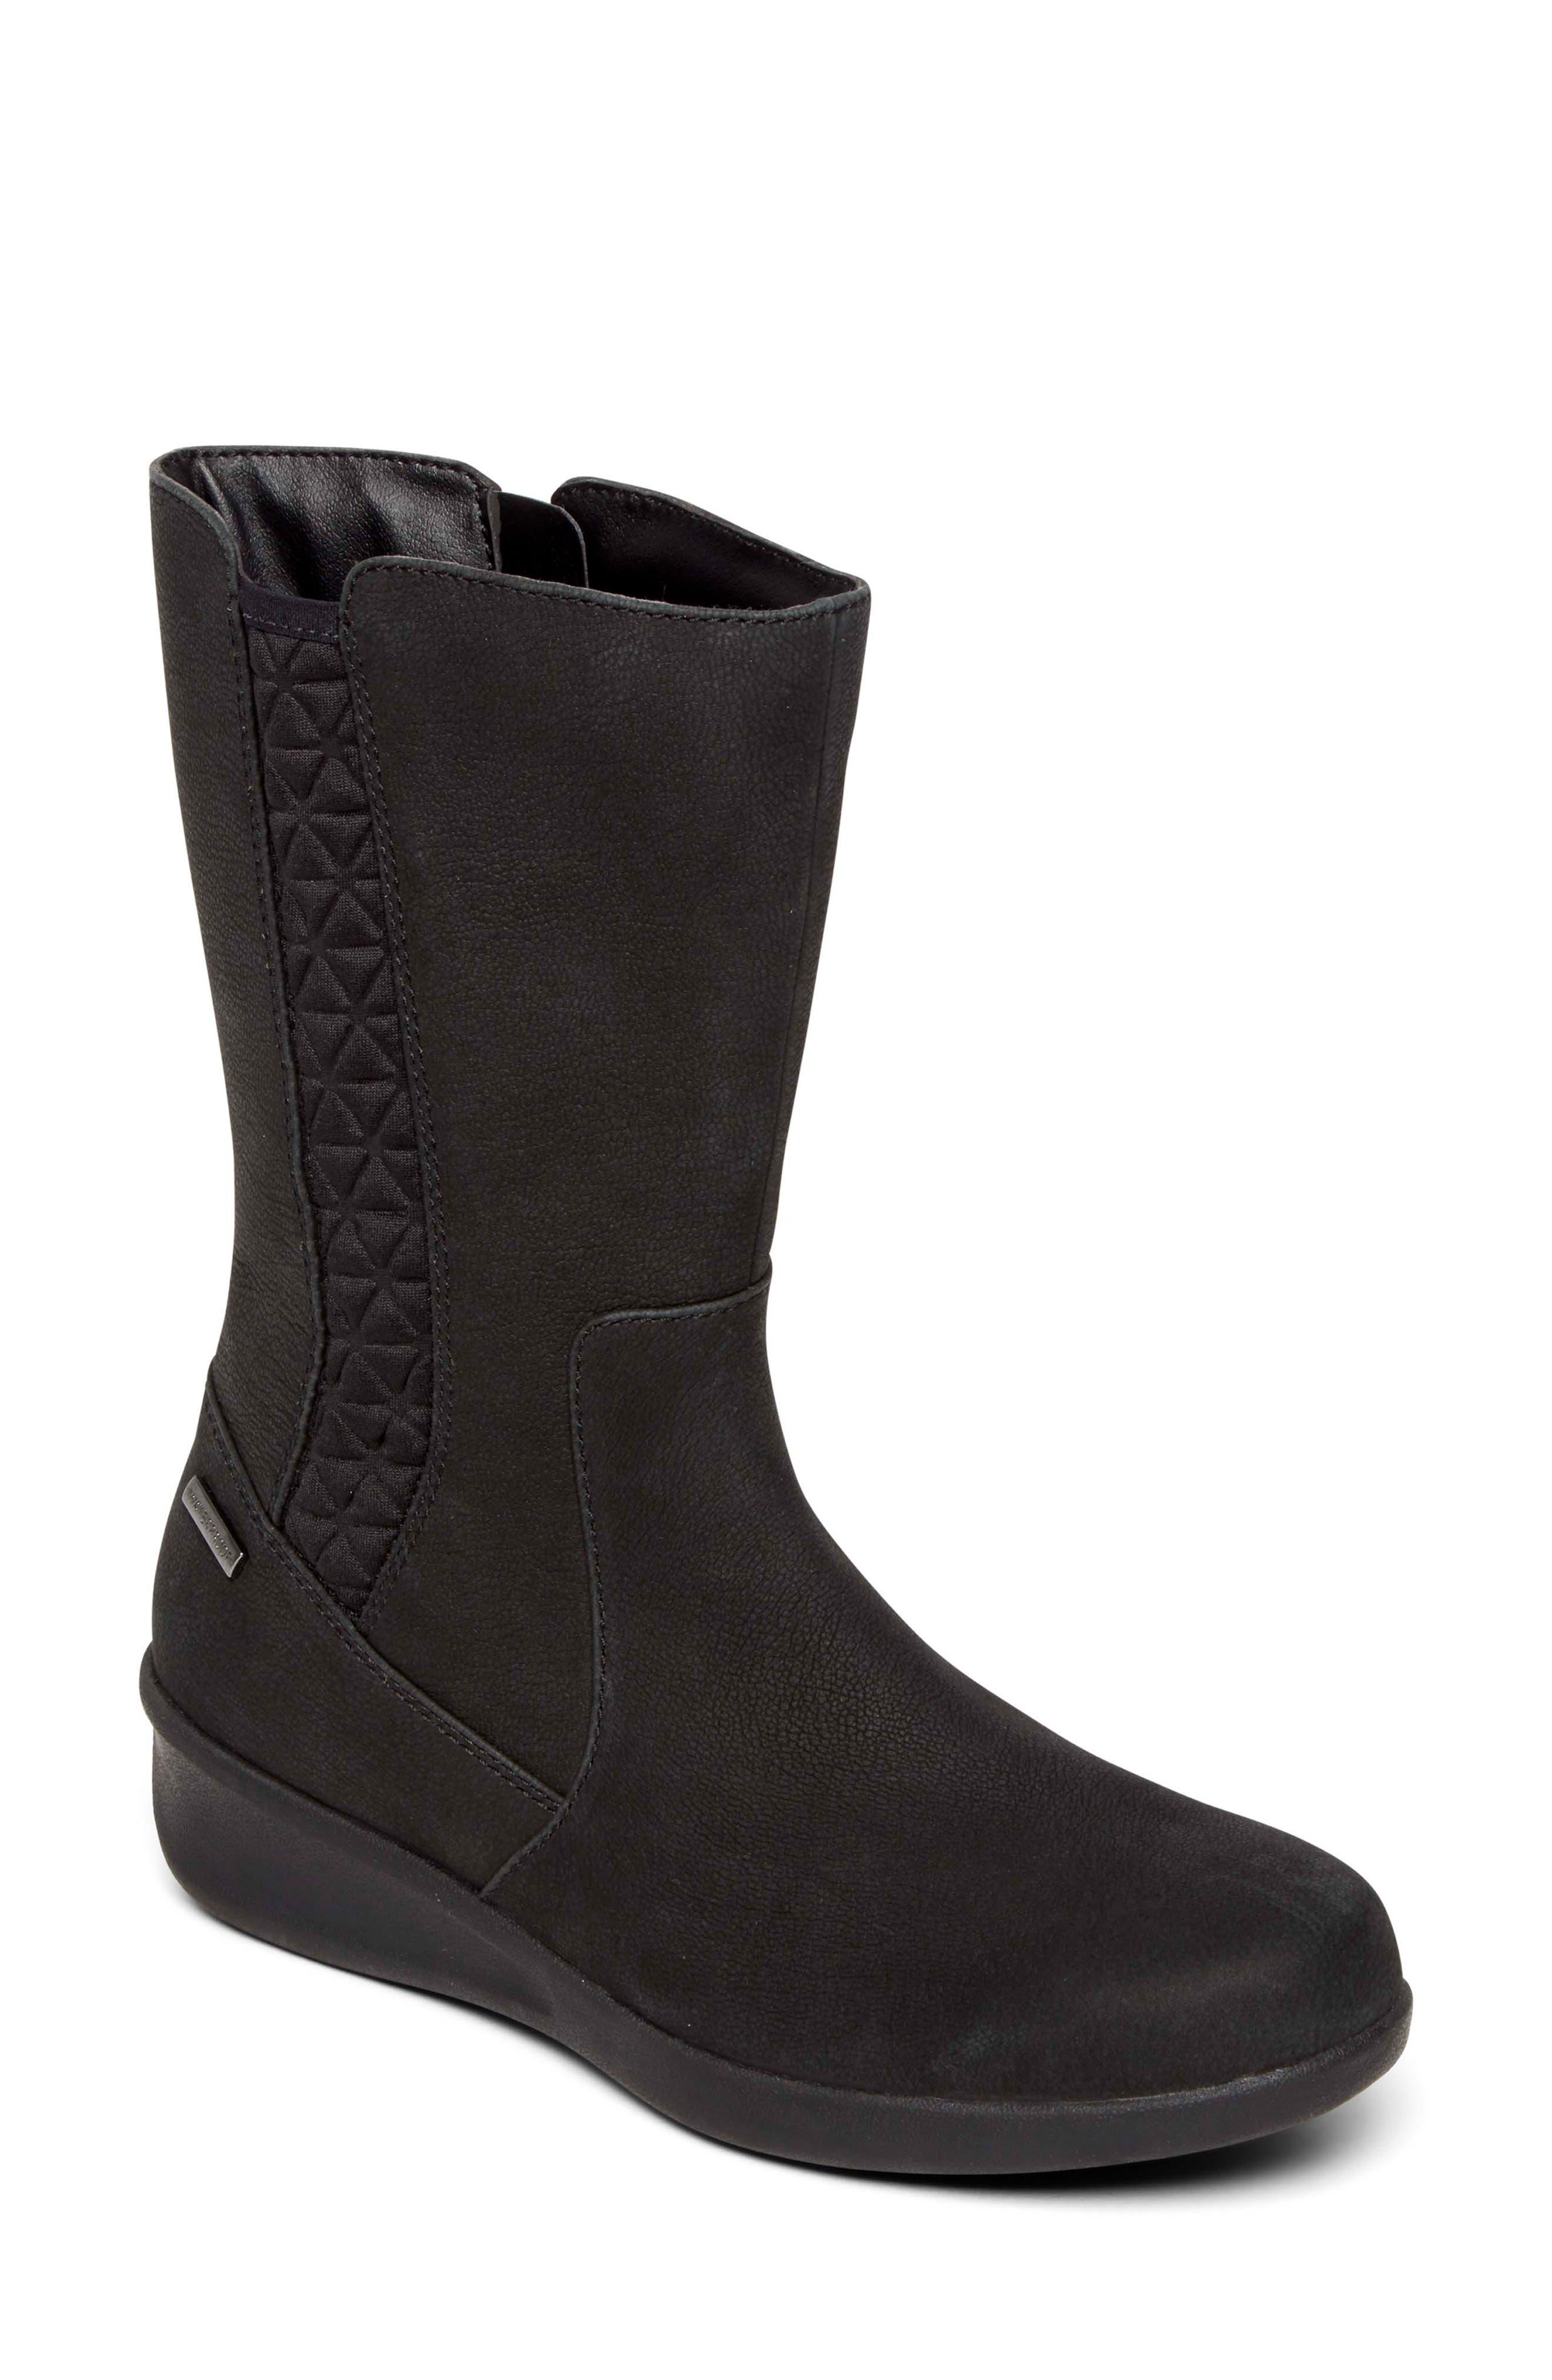 Fairlee Waterproof Snow Boot